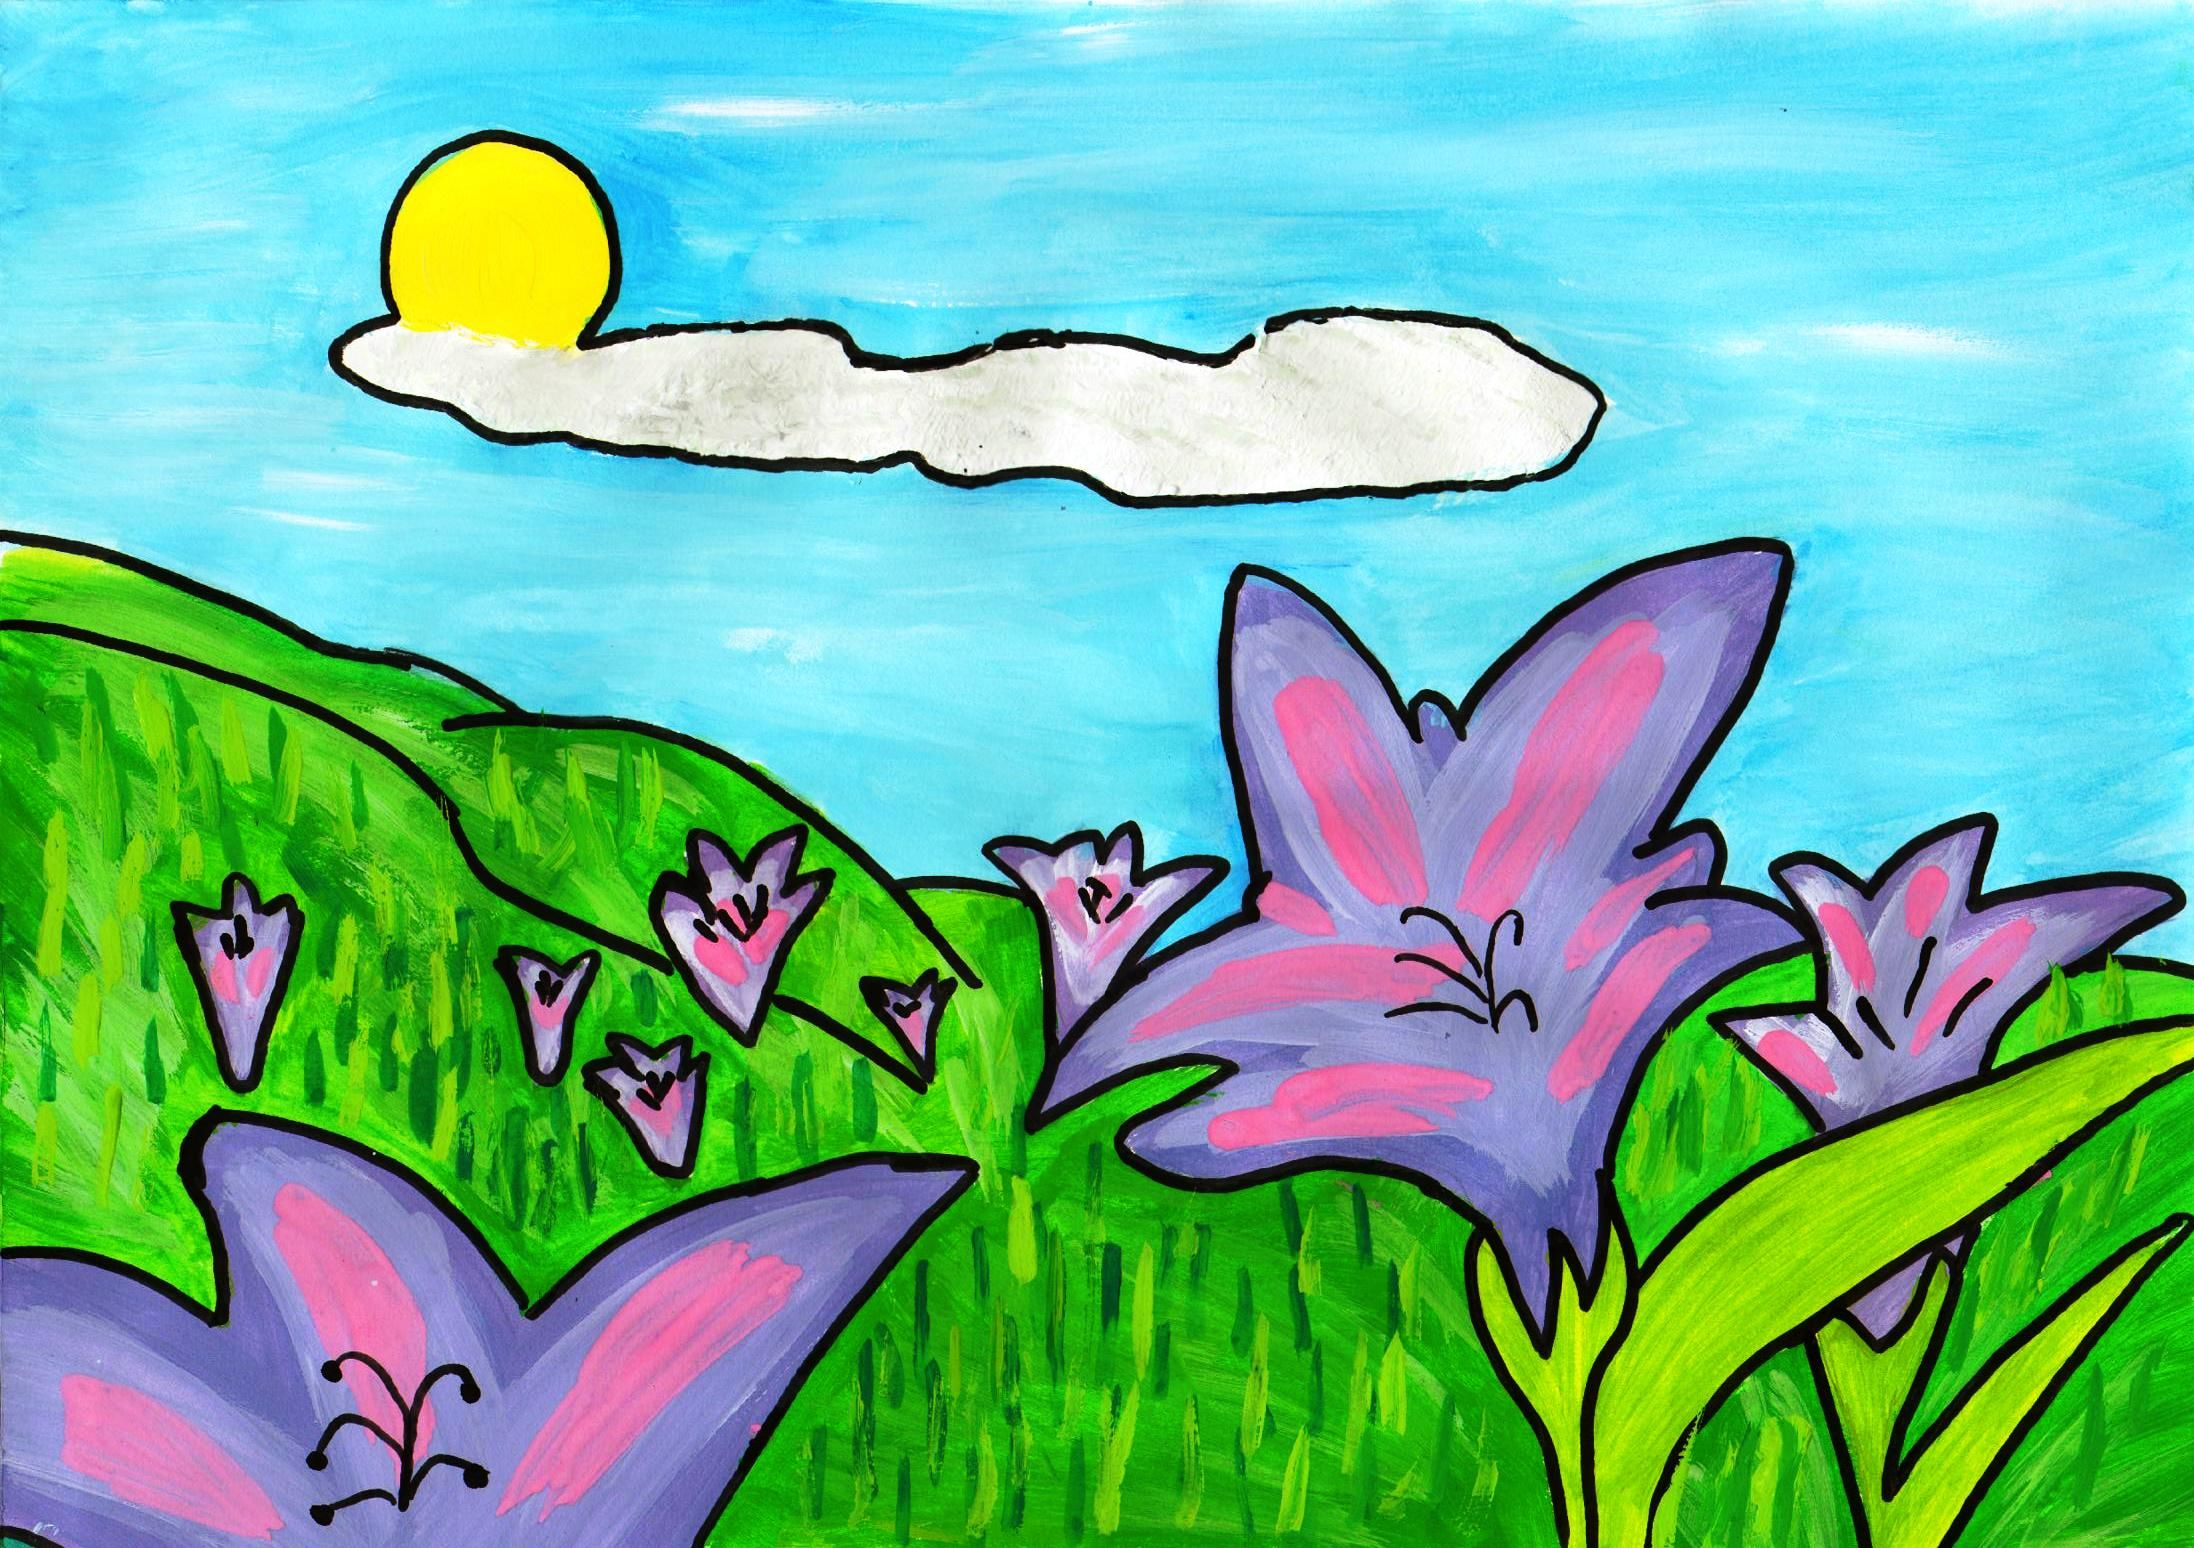 Desene De Colorat Flori Year Of Clean Water